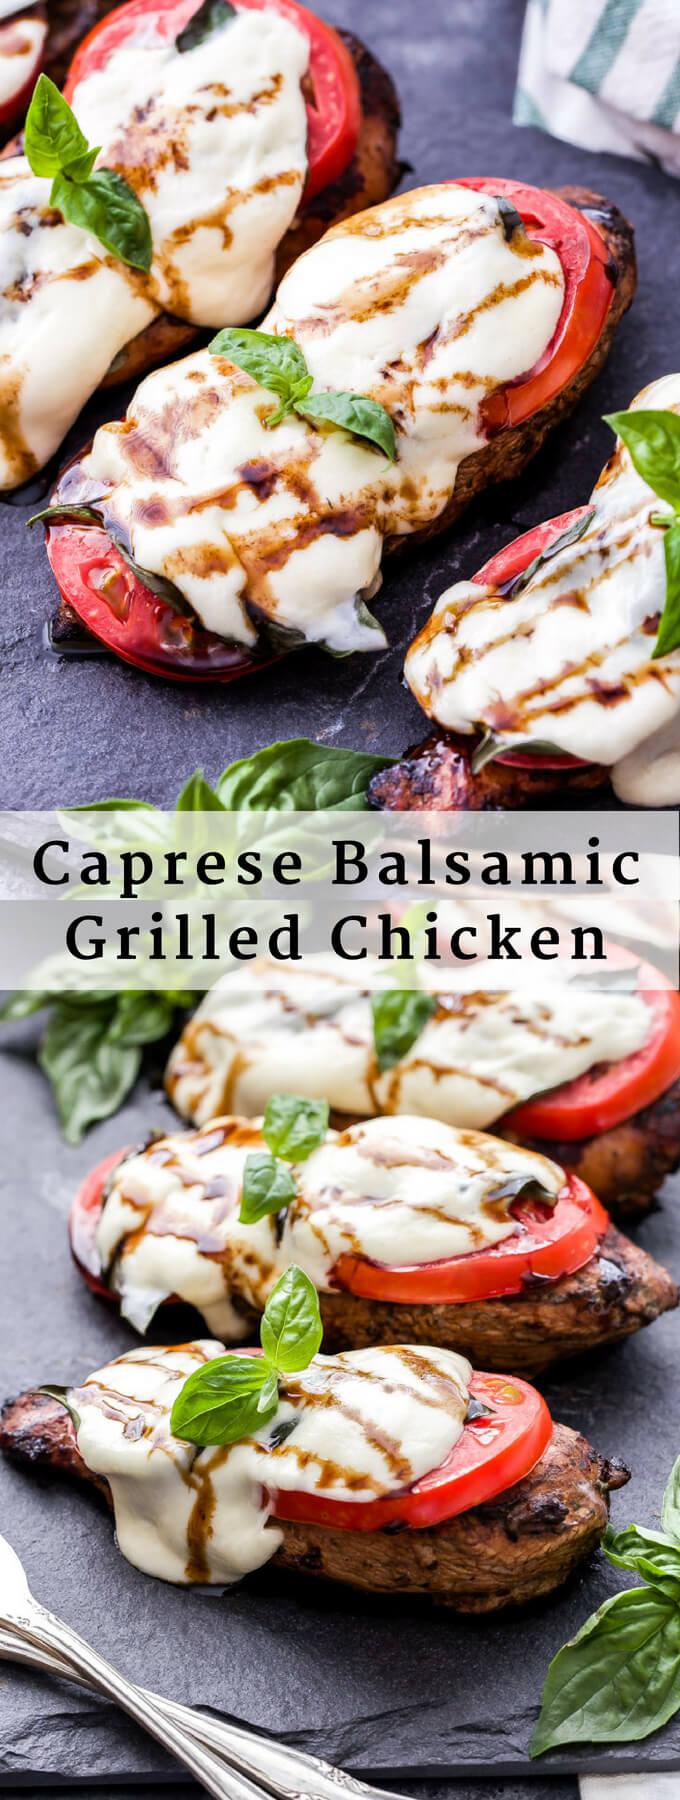 Caprese Balsamic Grilled Chicken - Recipe Runner